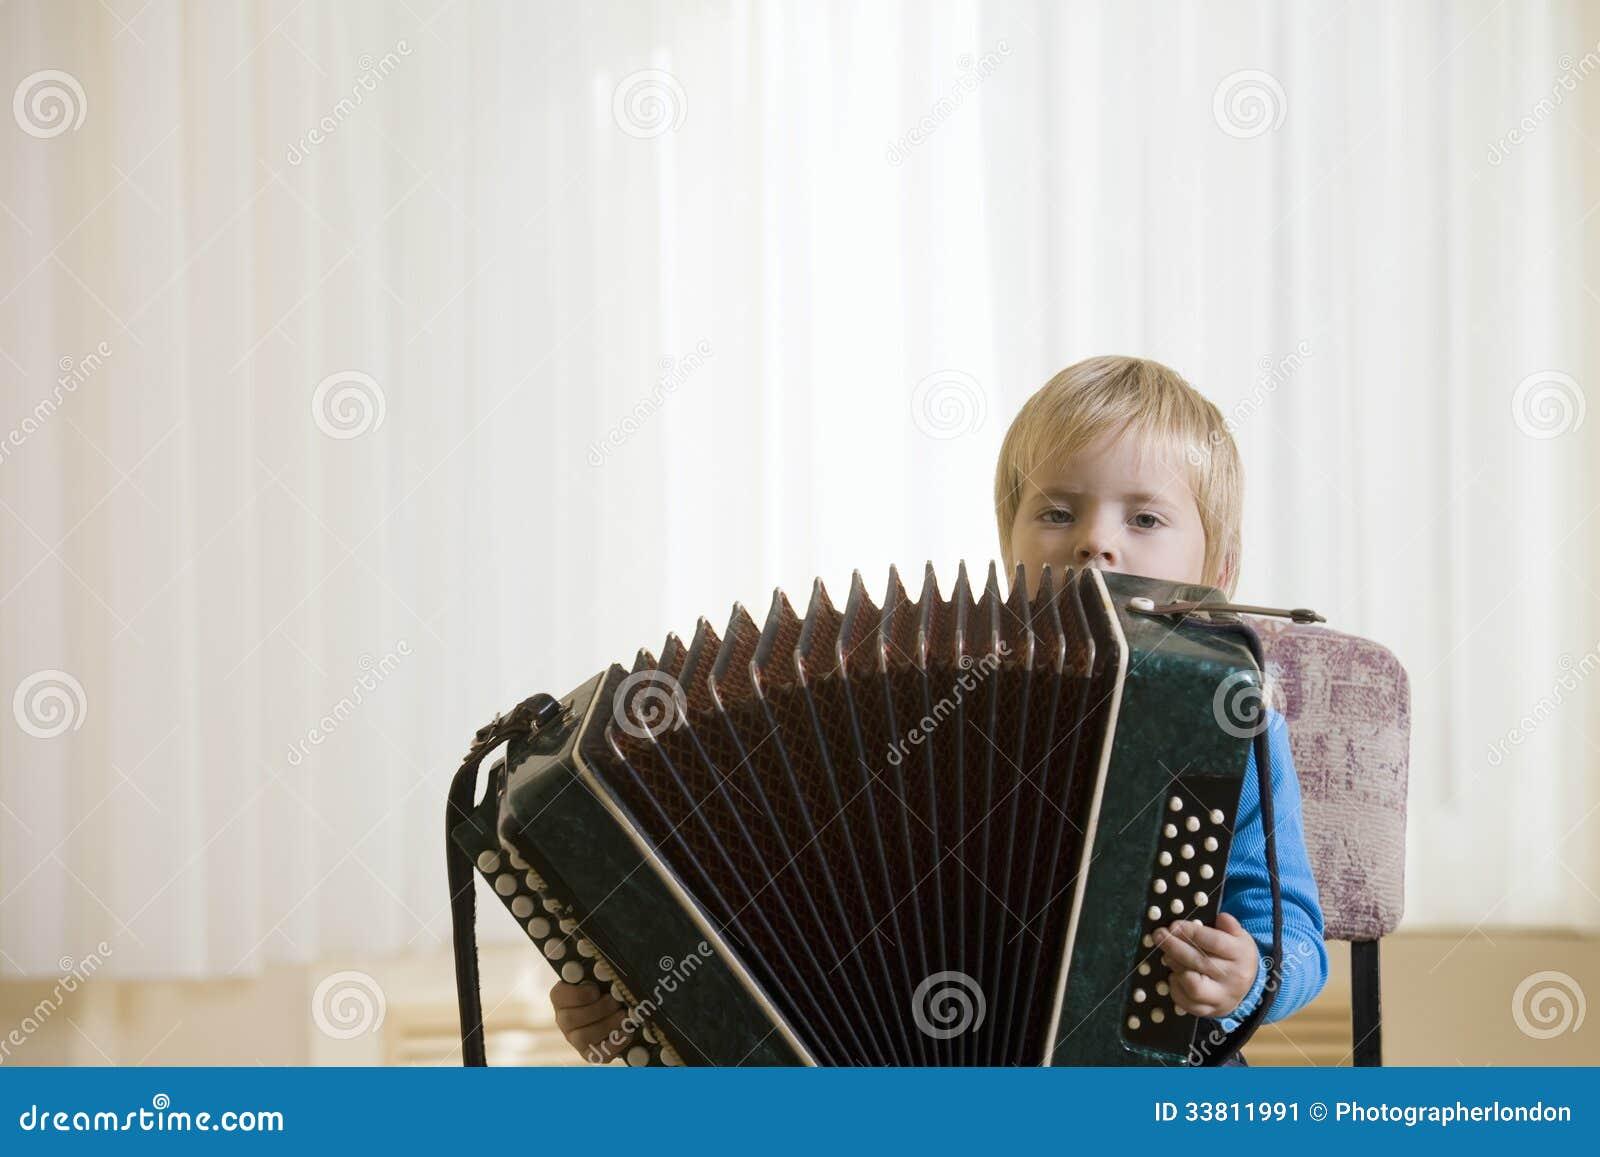 child prodigy accordion instructions